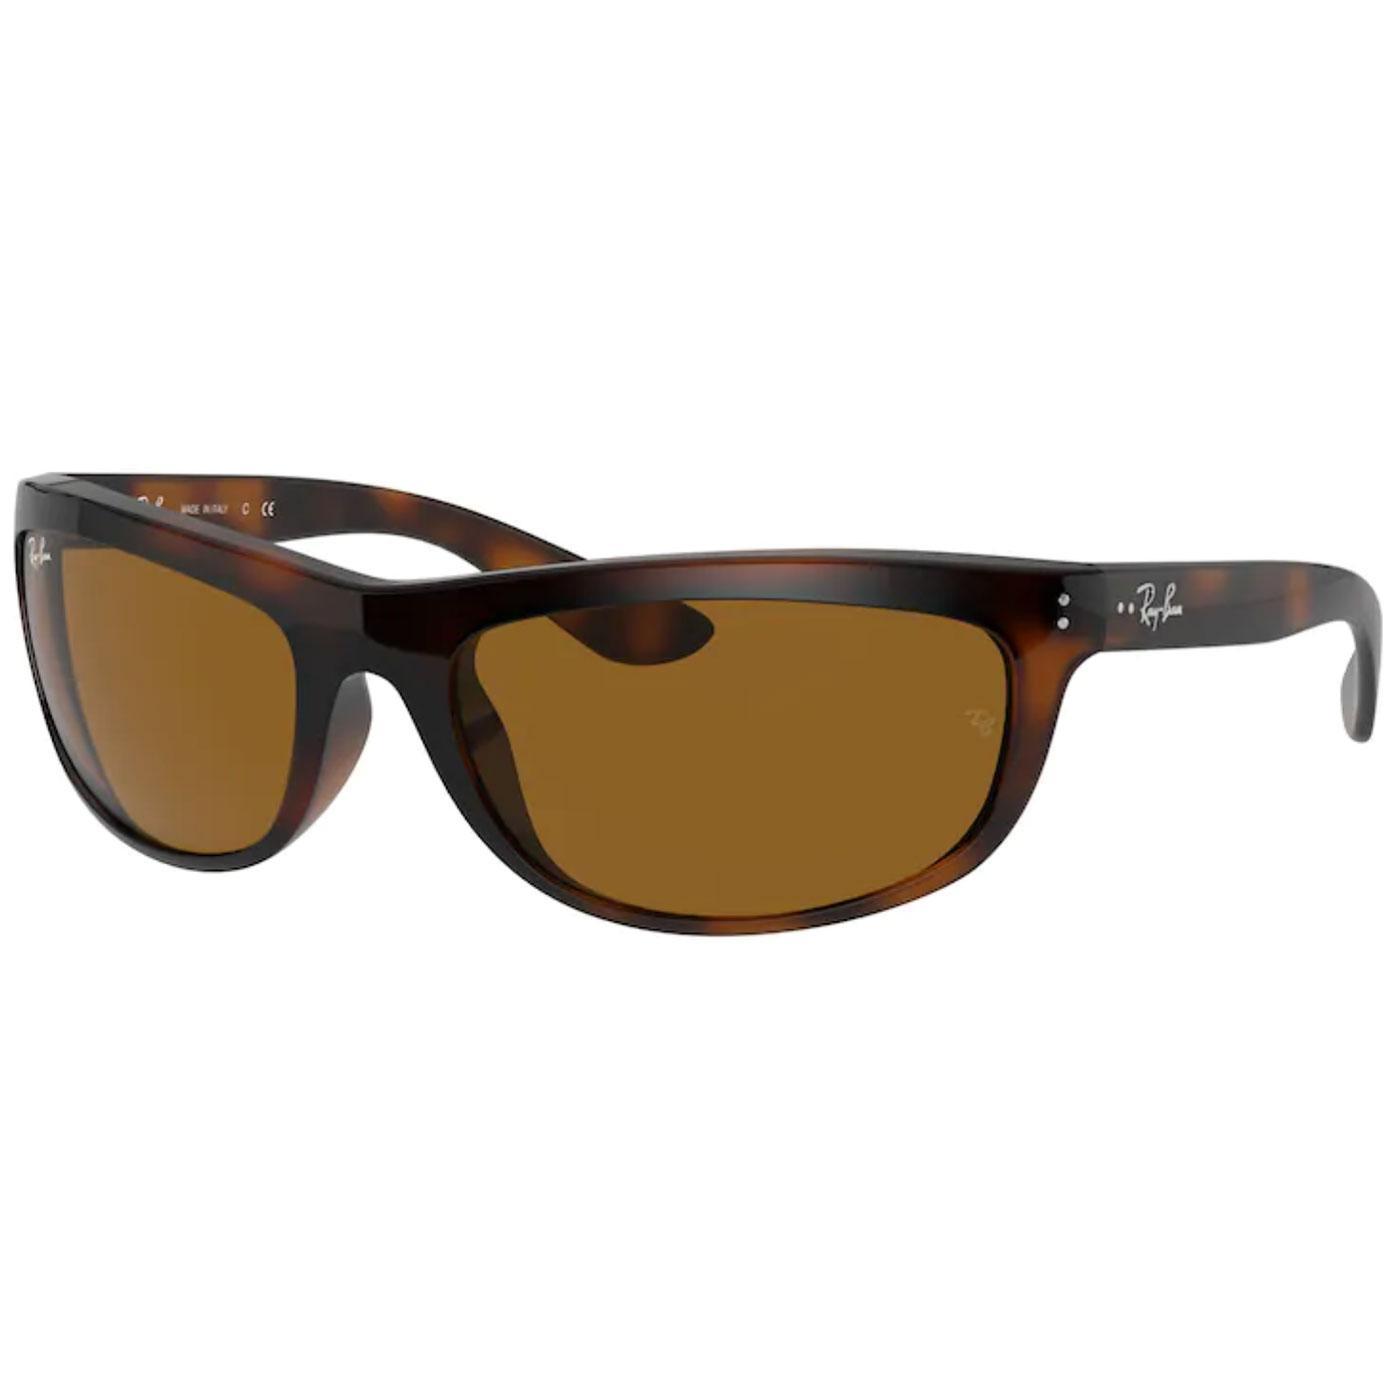 Balorama RAY-BAN Wrap Round Sunglasses - Dk Havana